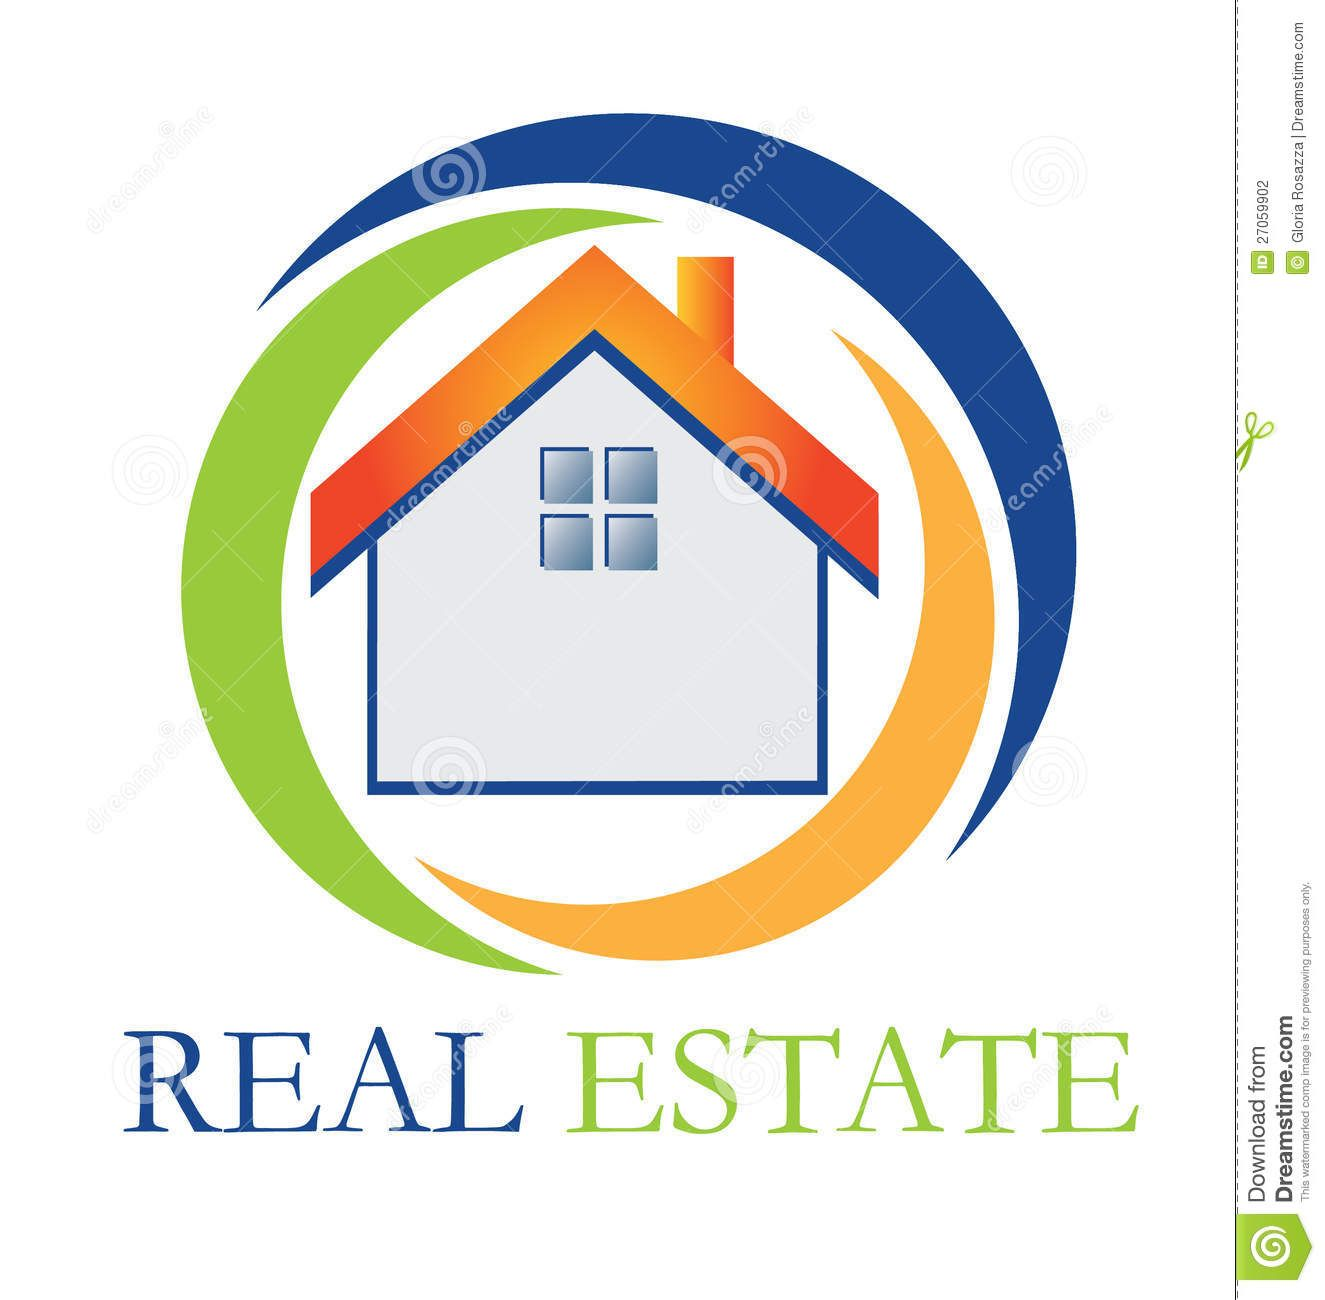 Free logo design for real estate